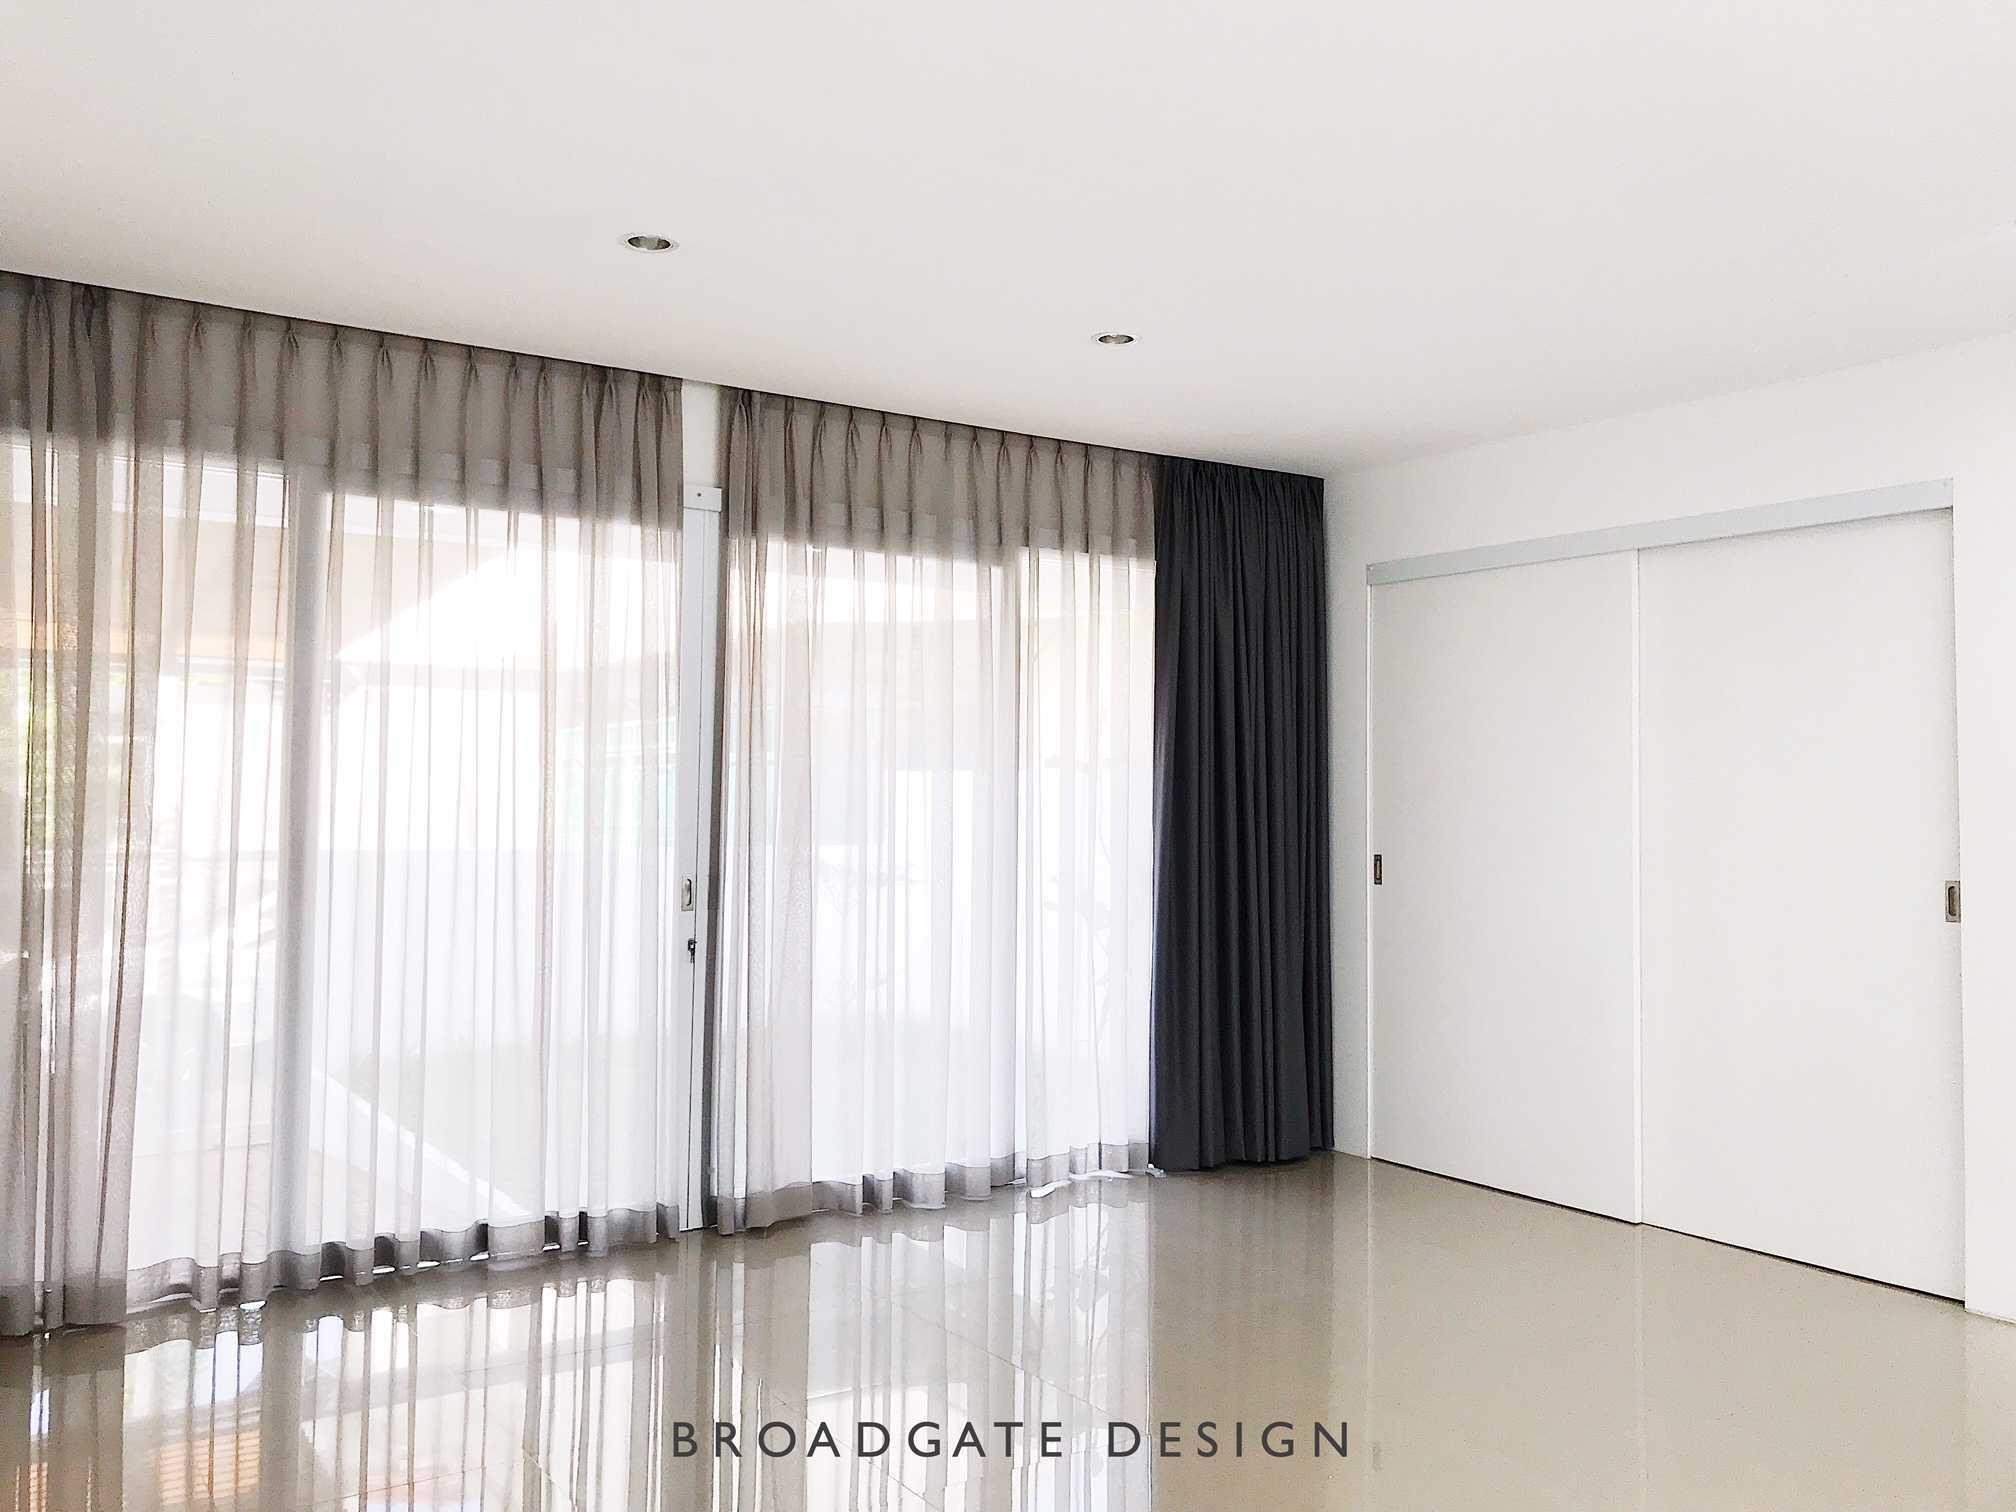 Broadgate Iv House Lippo Karawaci, Binong, Kec. Curug, Tangerang, Banten, Indonesia Lippo Karawaci, Binong, Kec. Curug, Tangerang, Banten, Indonesia Broadgate-Iv-House  74182